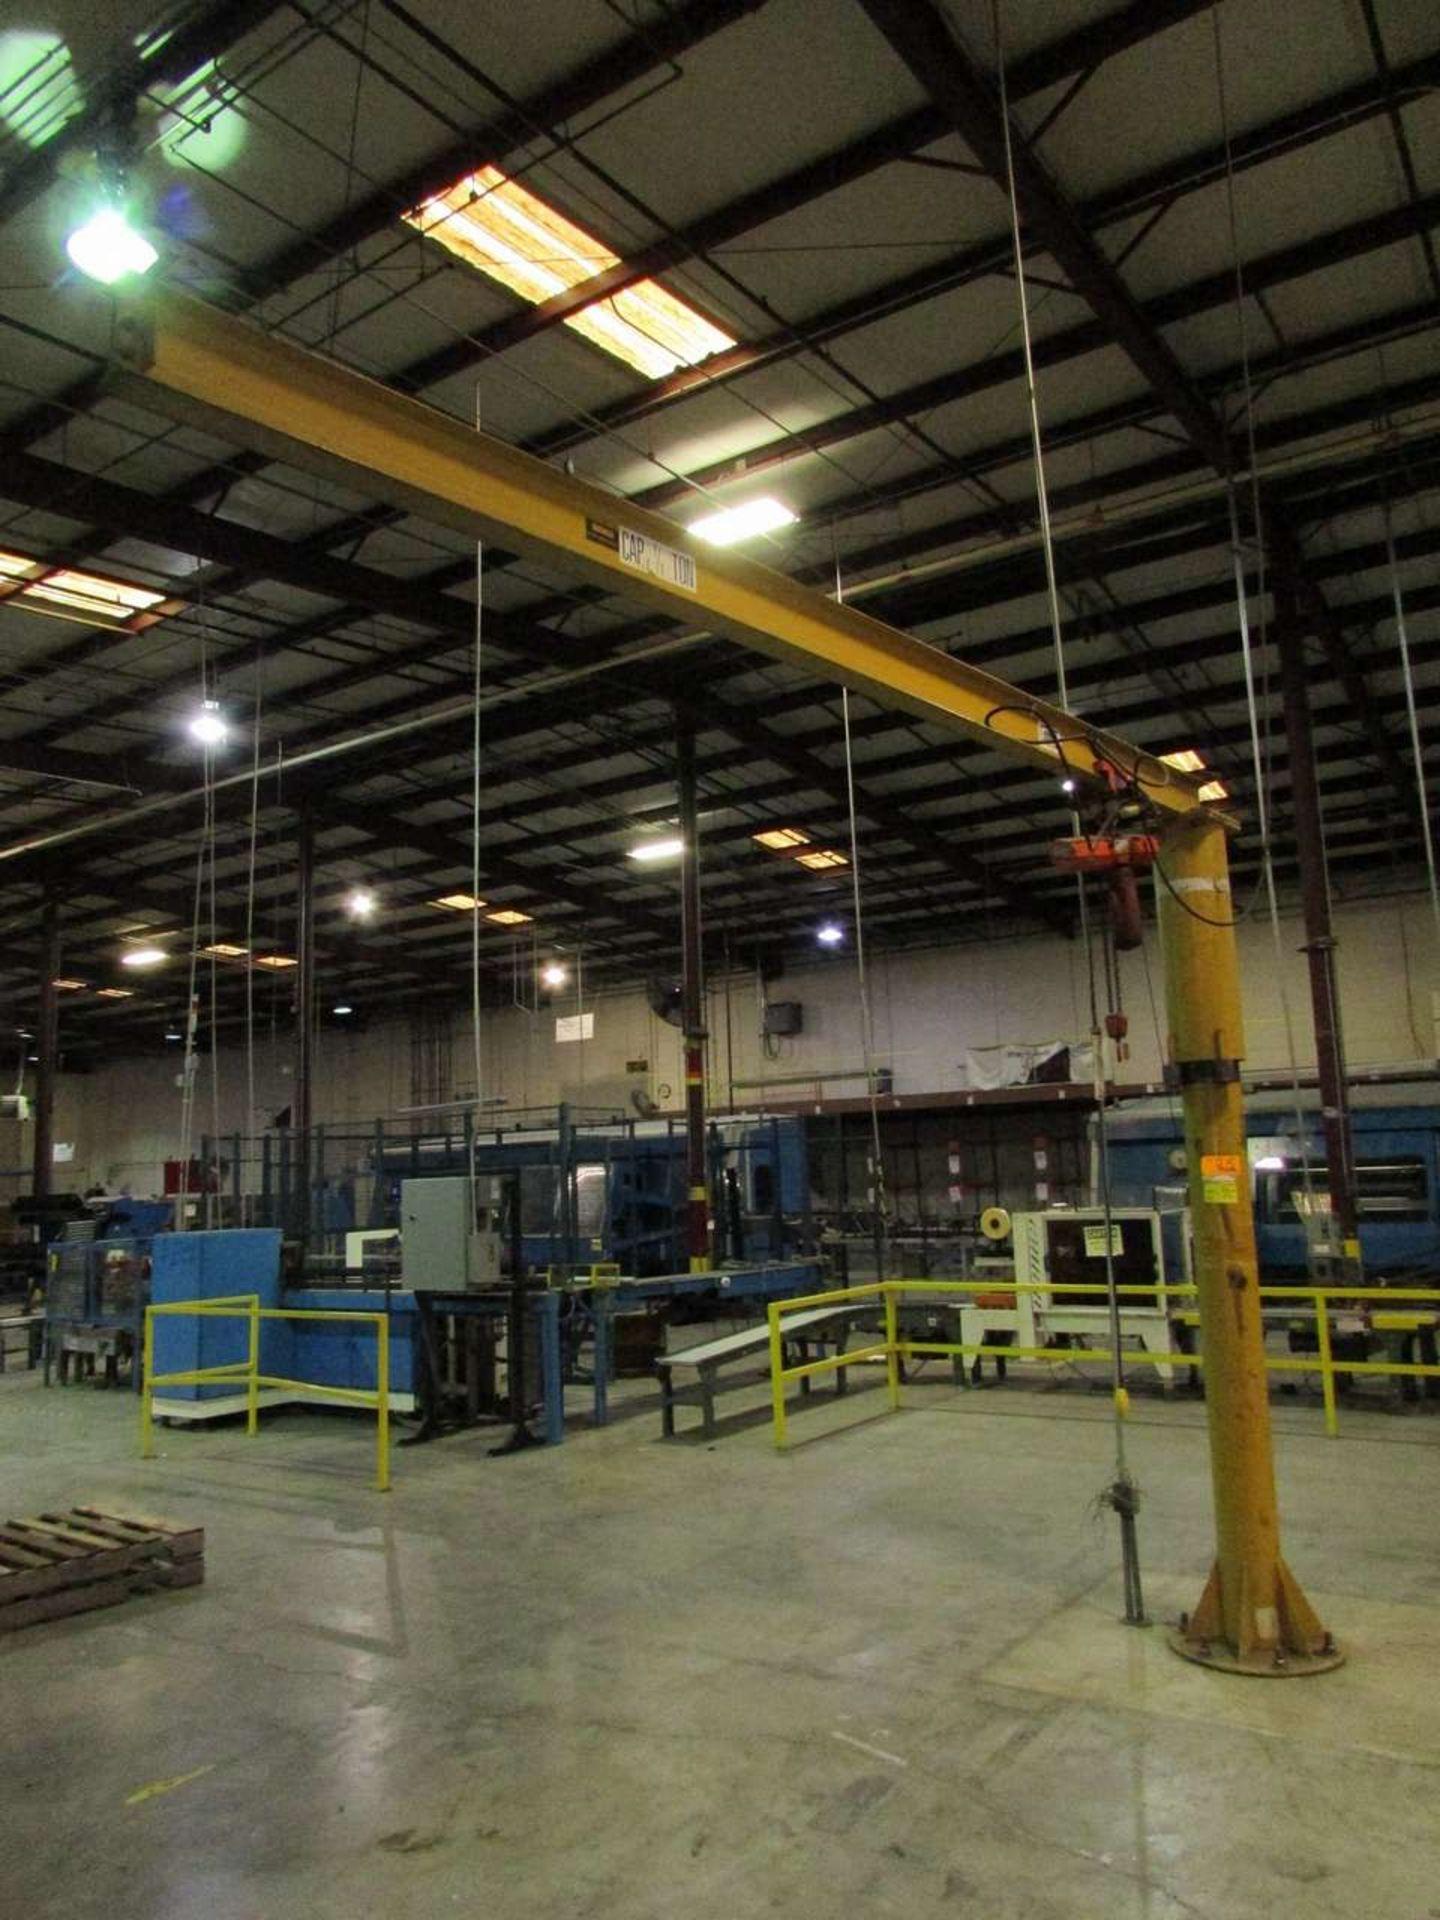 Lot 25 - Contrx industries 1/4 Ton Free-Standing Jib Crane